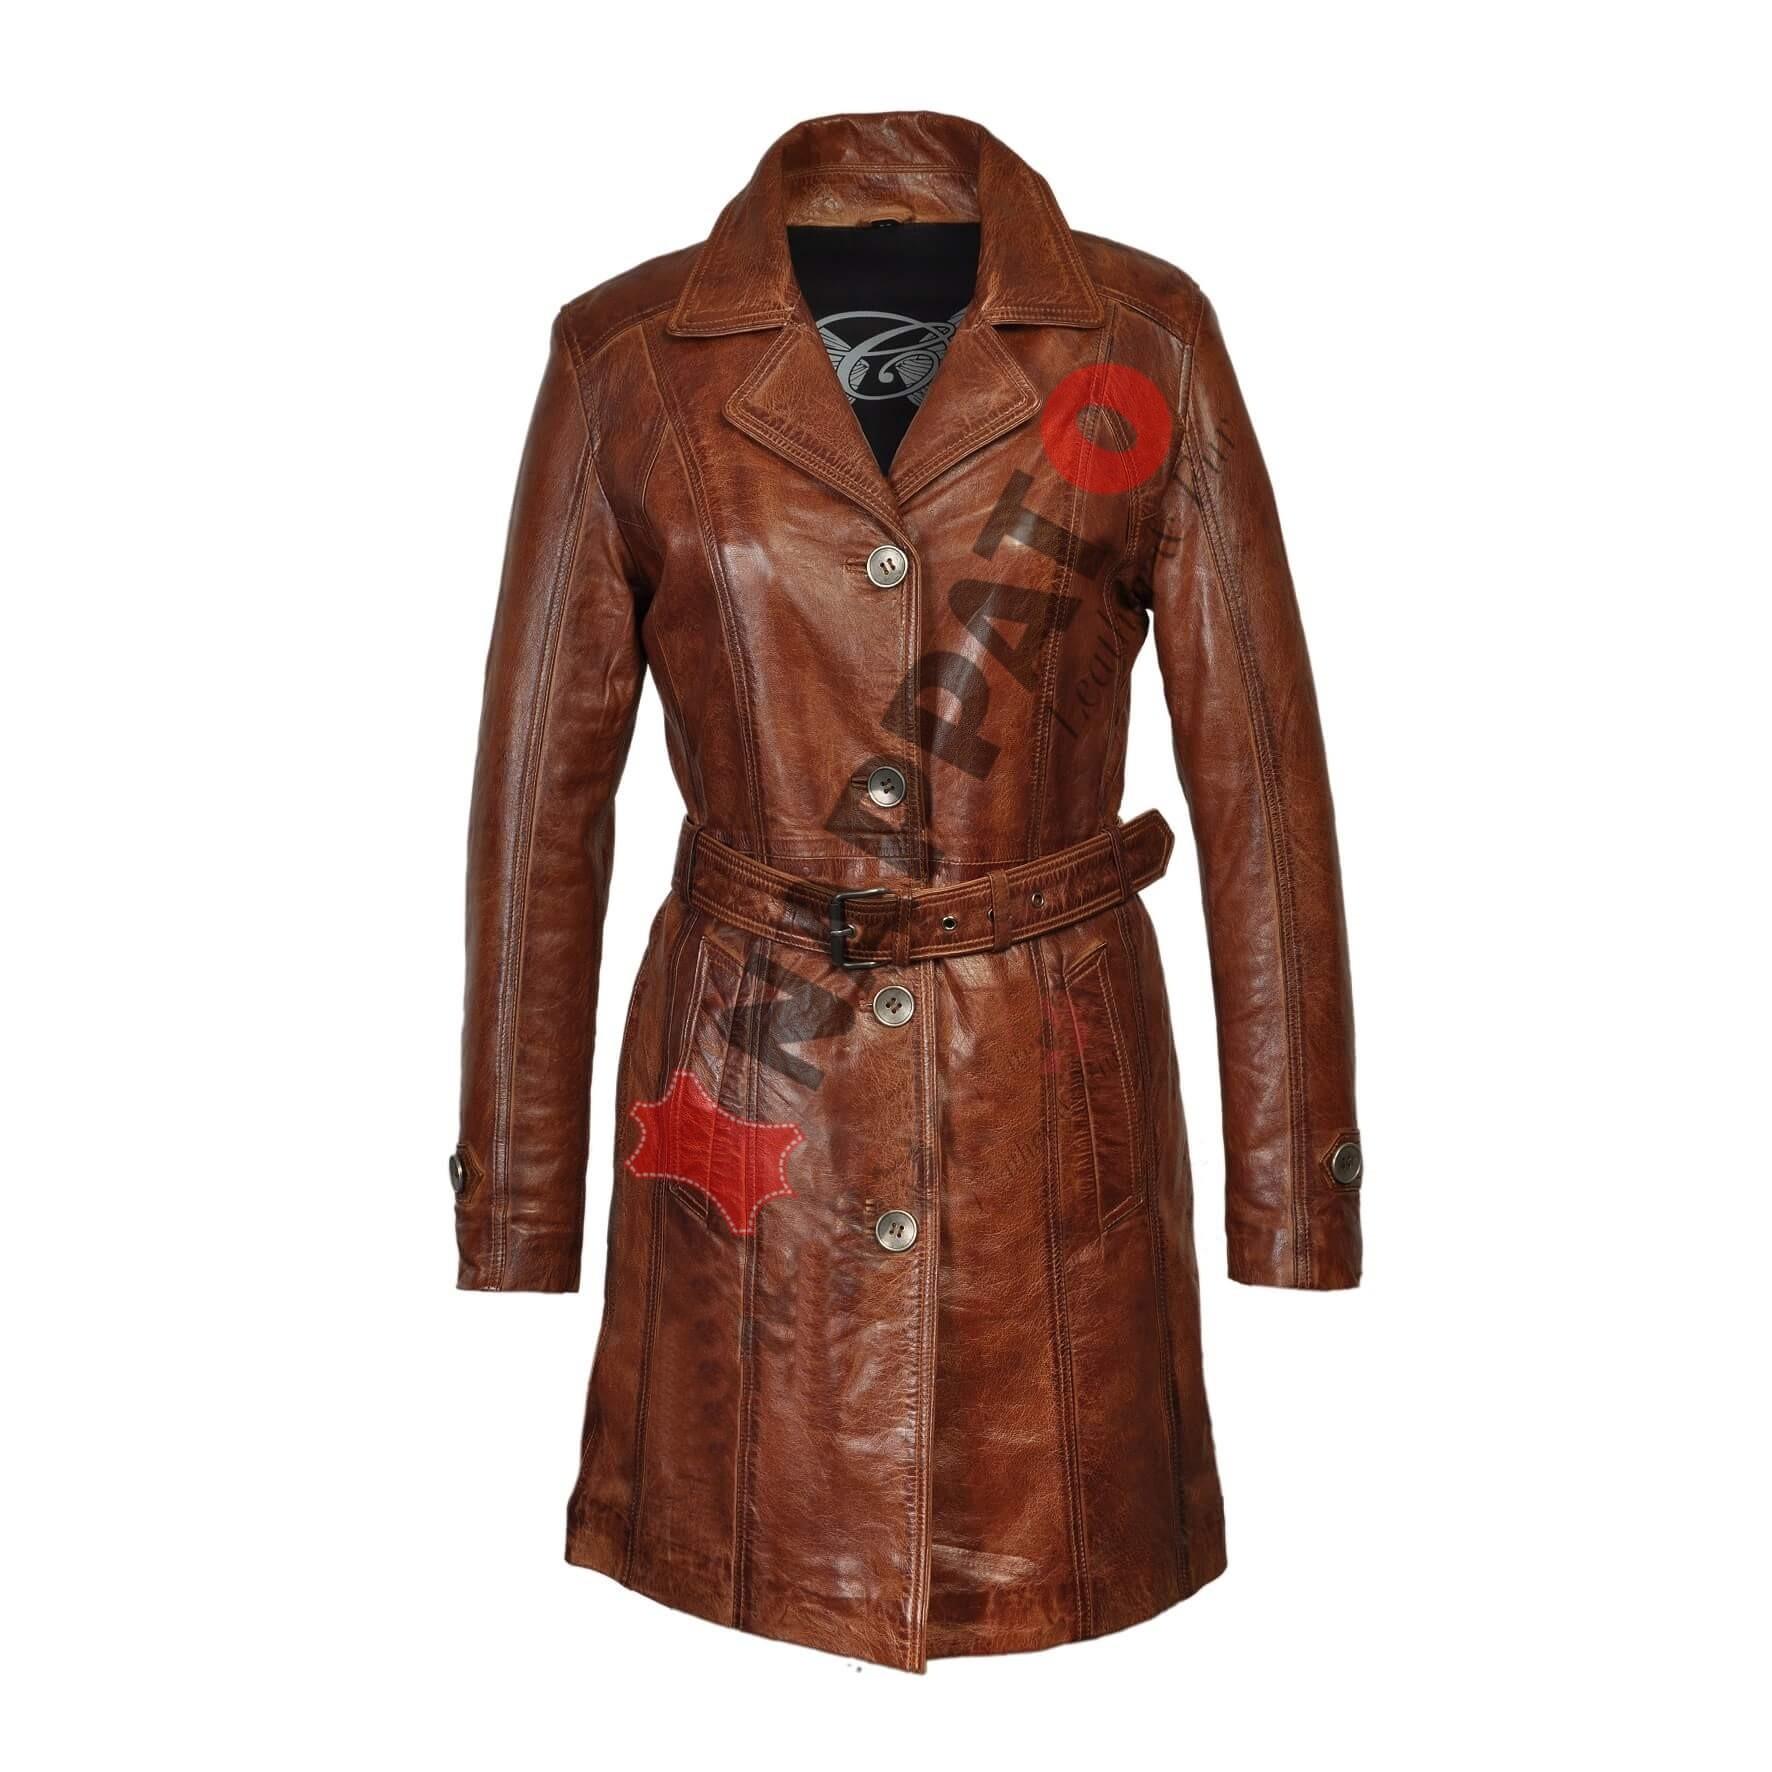 f9983b59095 Leren Jassen Dames - Trench Coat Brandi - Nappato Leather